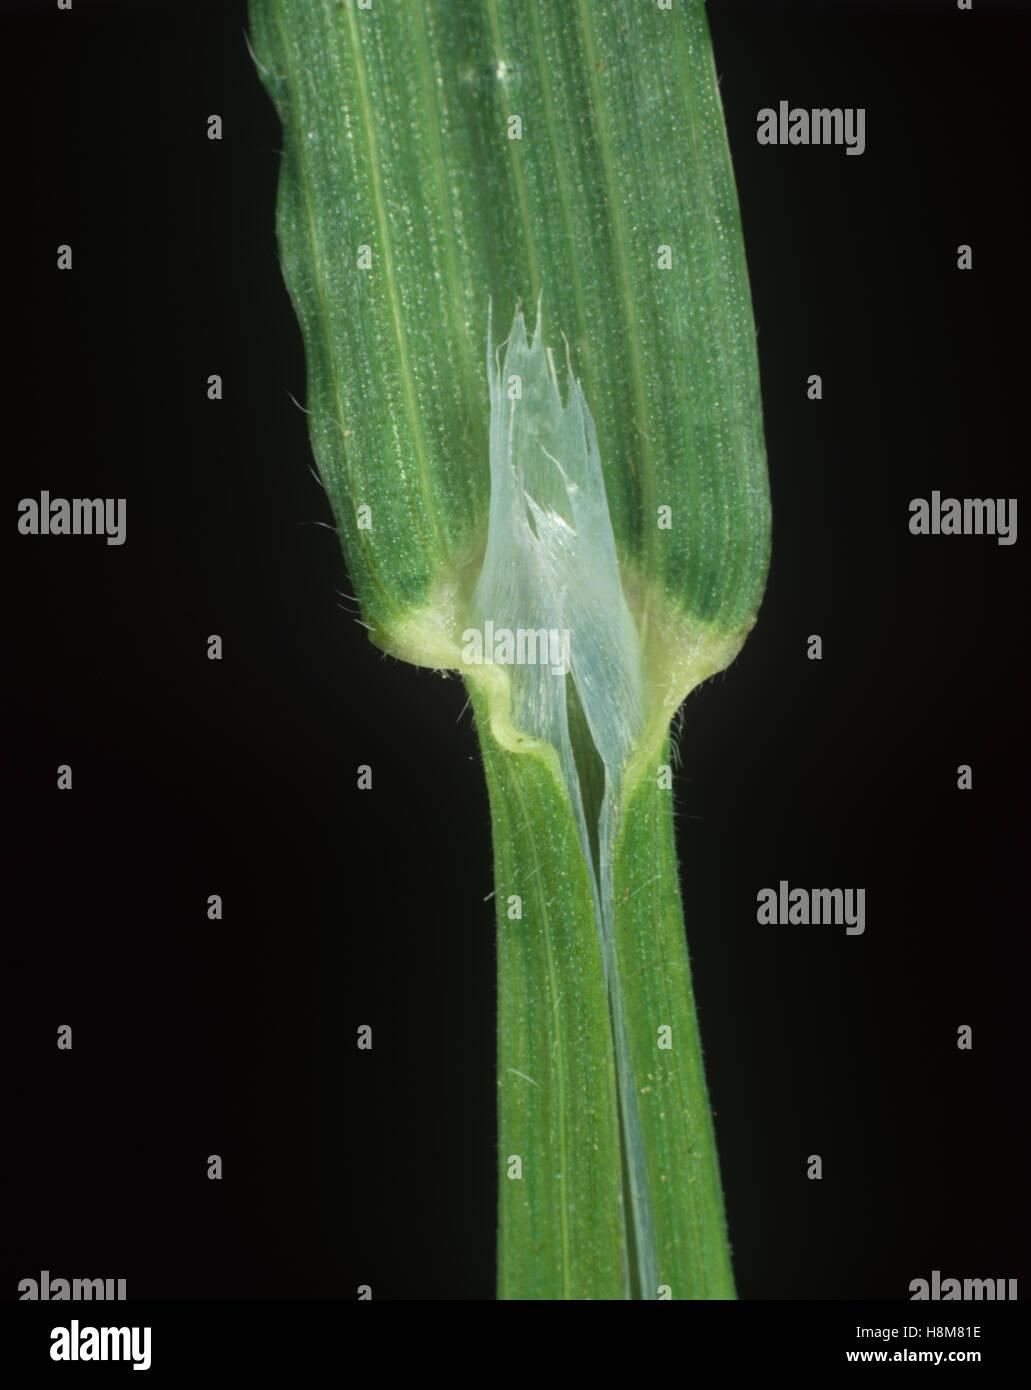 Sterile or barren brome, Bromus sterilis, leaf ligule - Stock Image